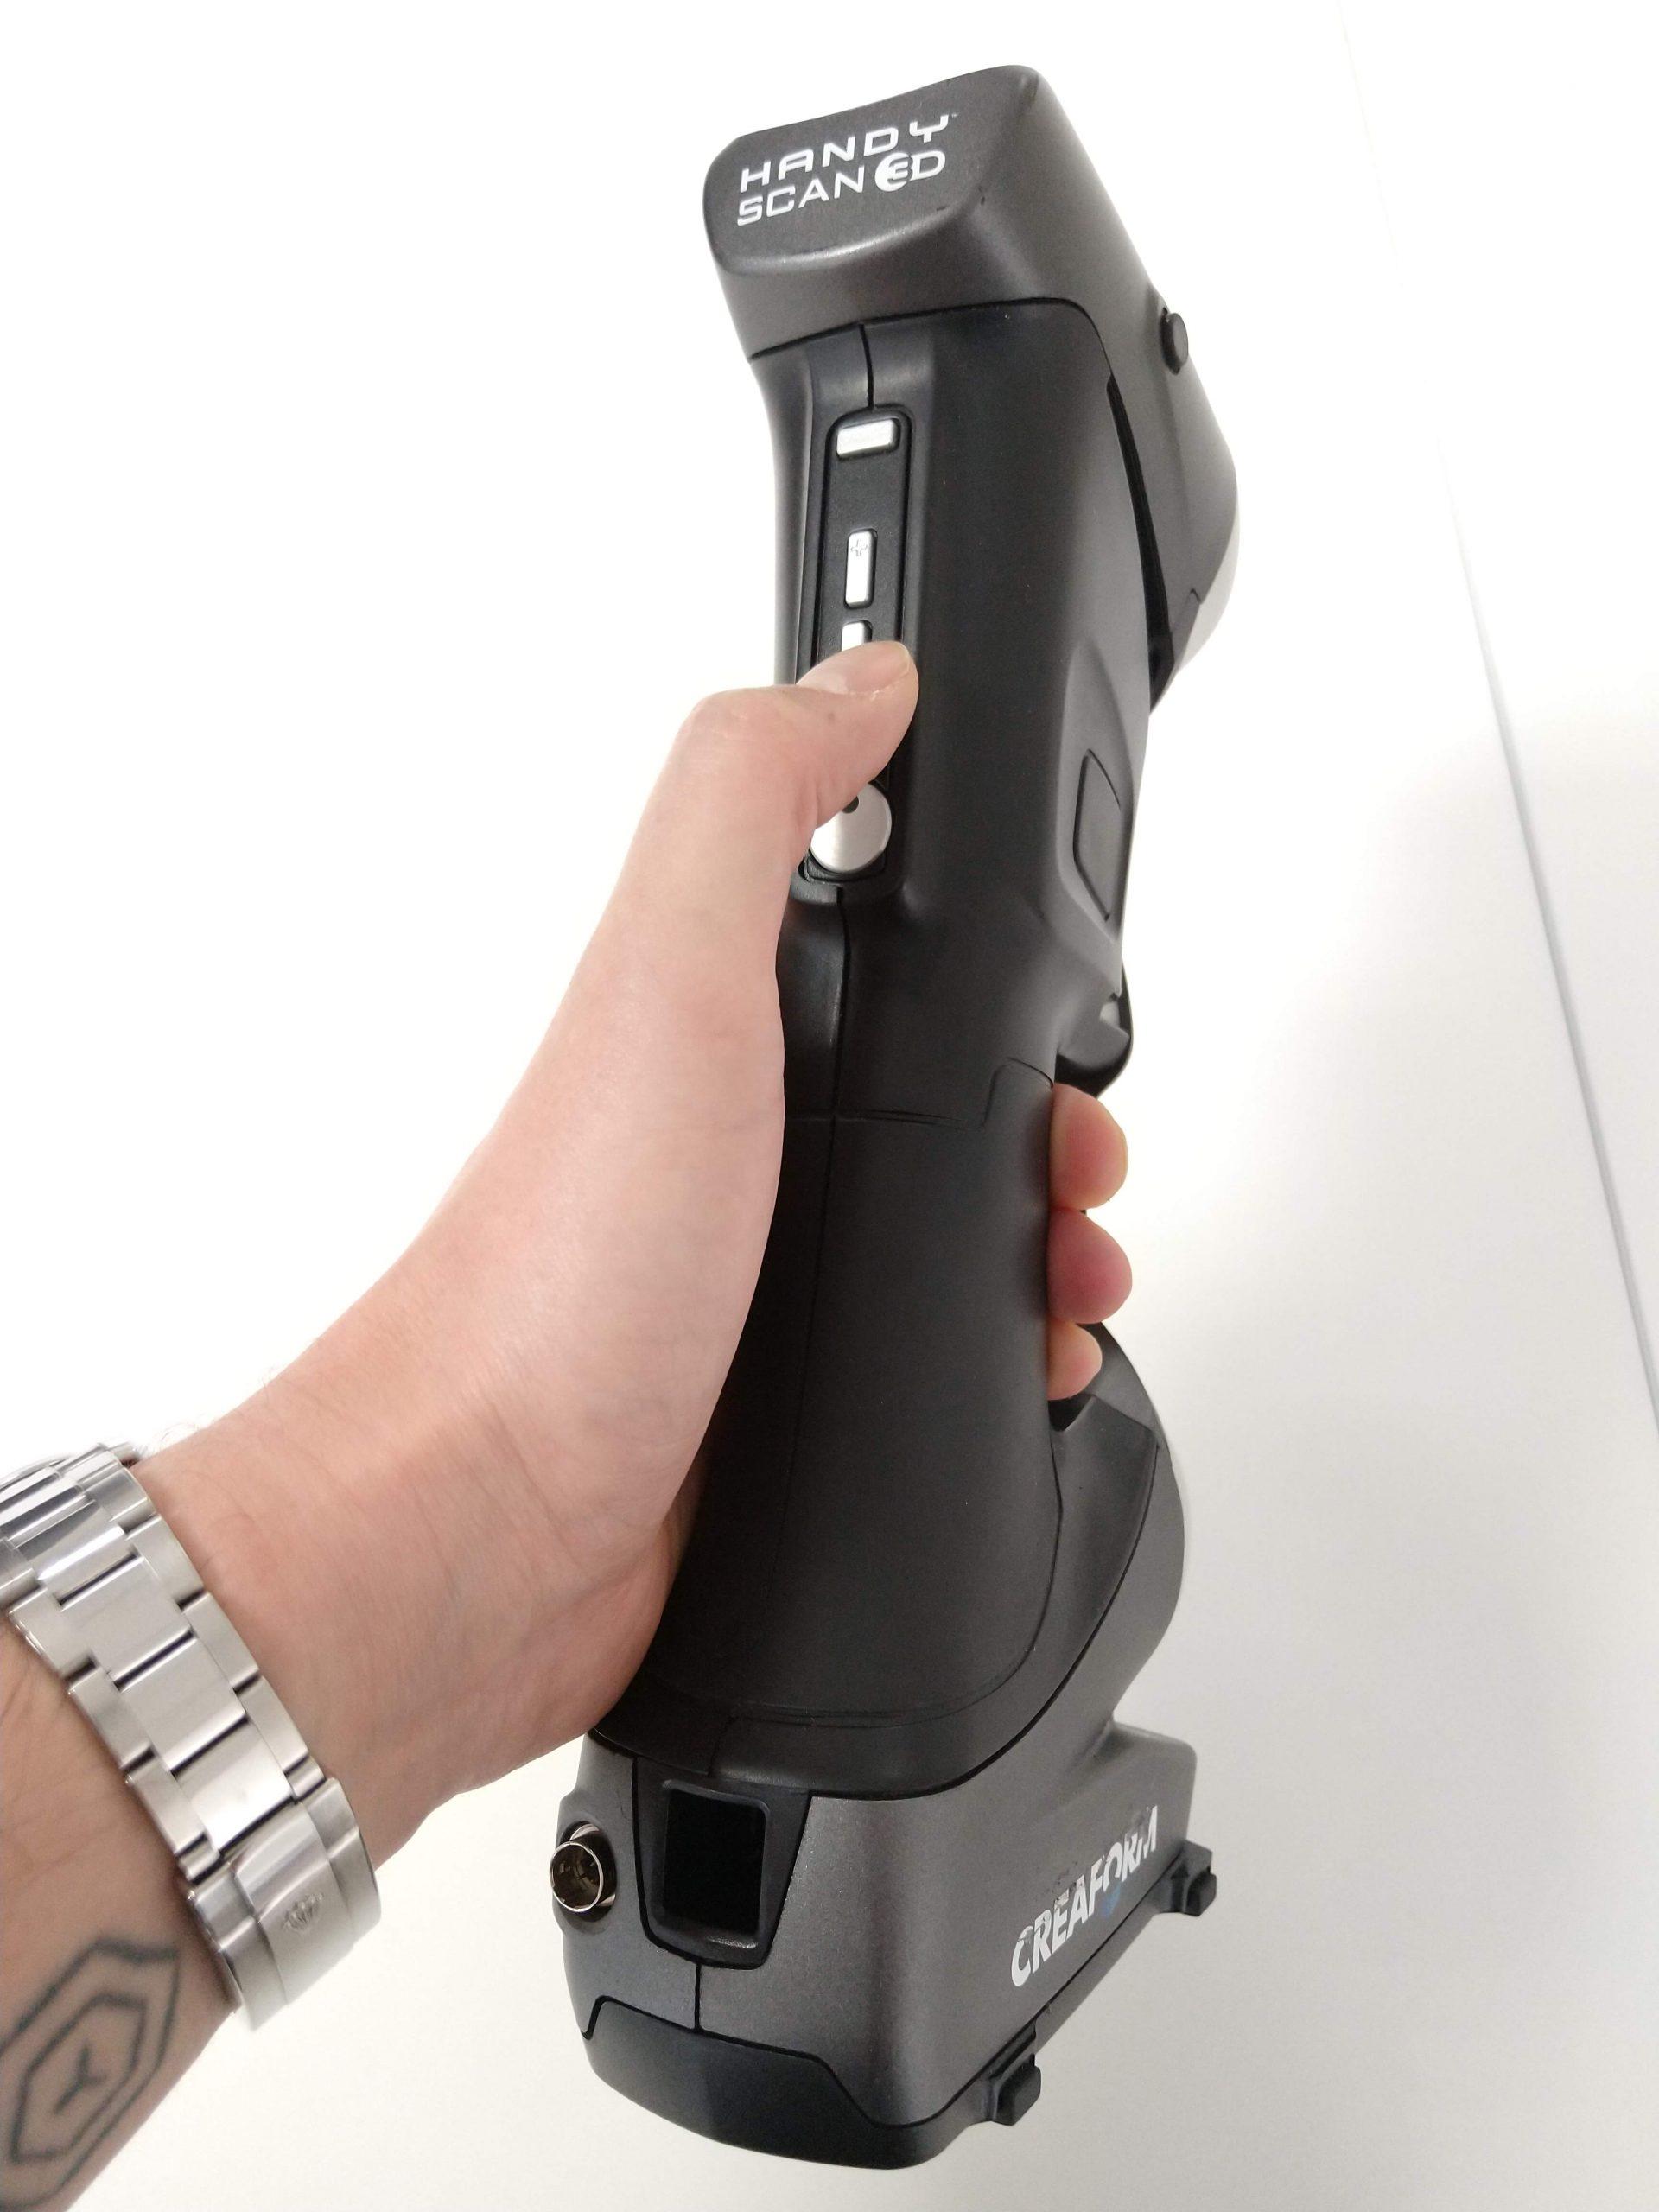 HandySCAN buttons and ergonomics